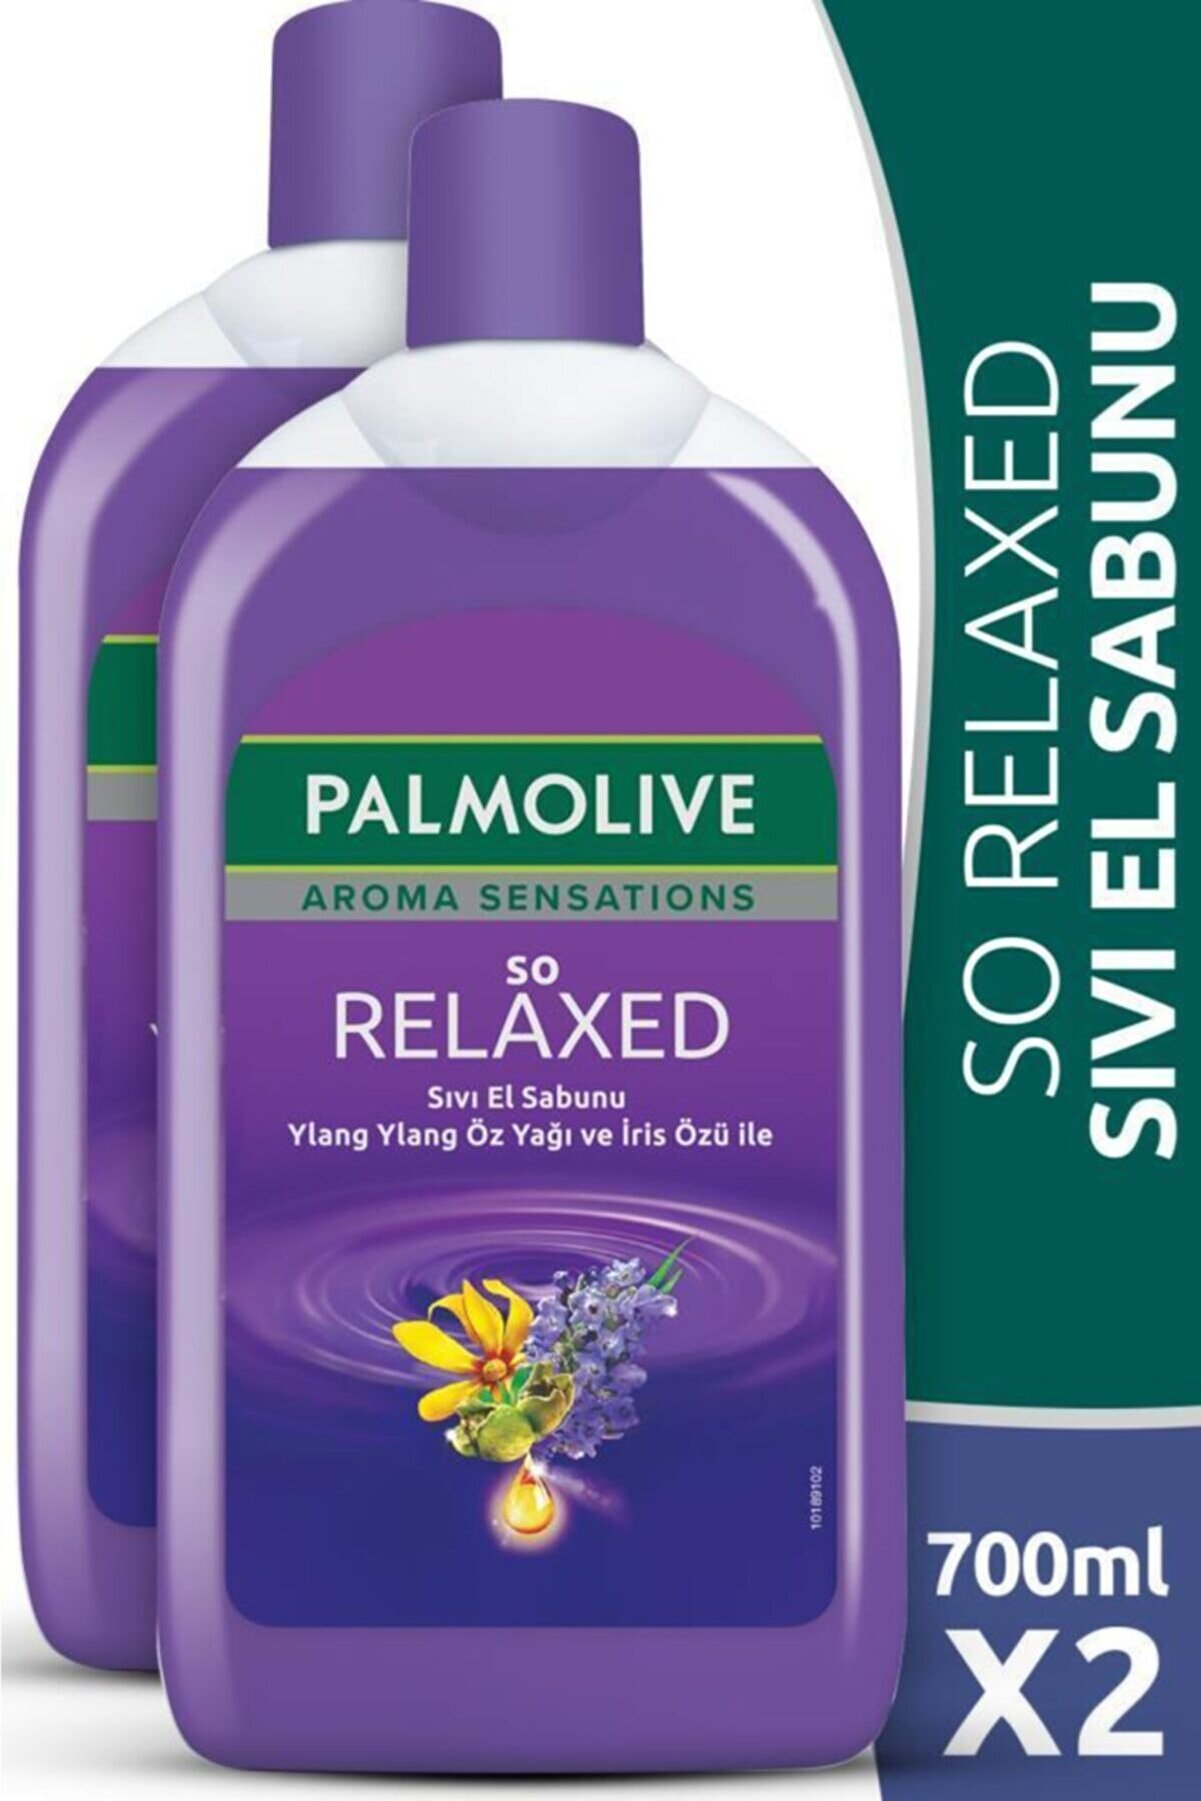 Palmolive Aroma Sensations So Relaxed Ylang Ylang Öz Yağı Ve Iris Özü Ile Sıvı El Sabunu 2 X 700 ml